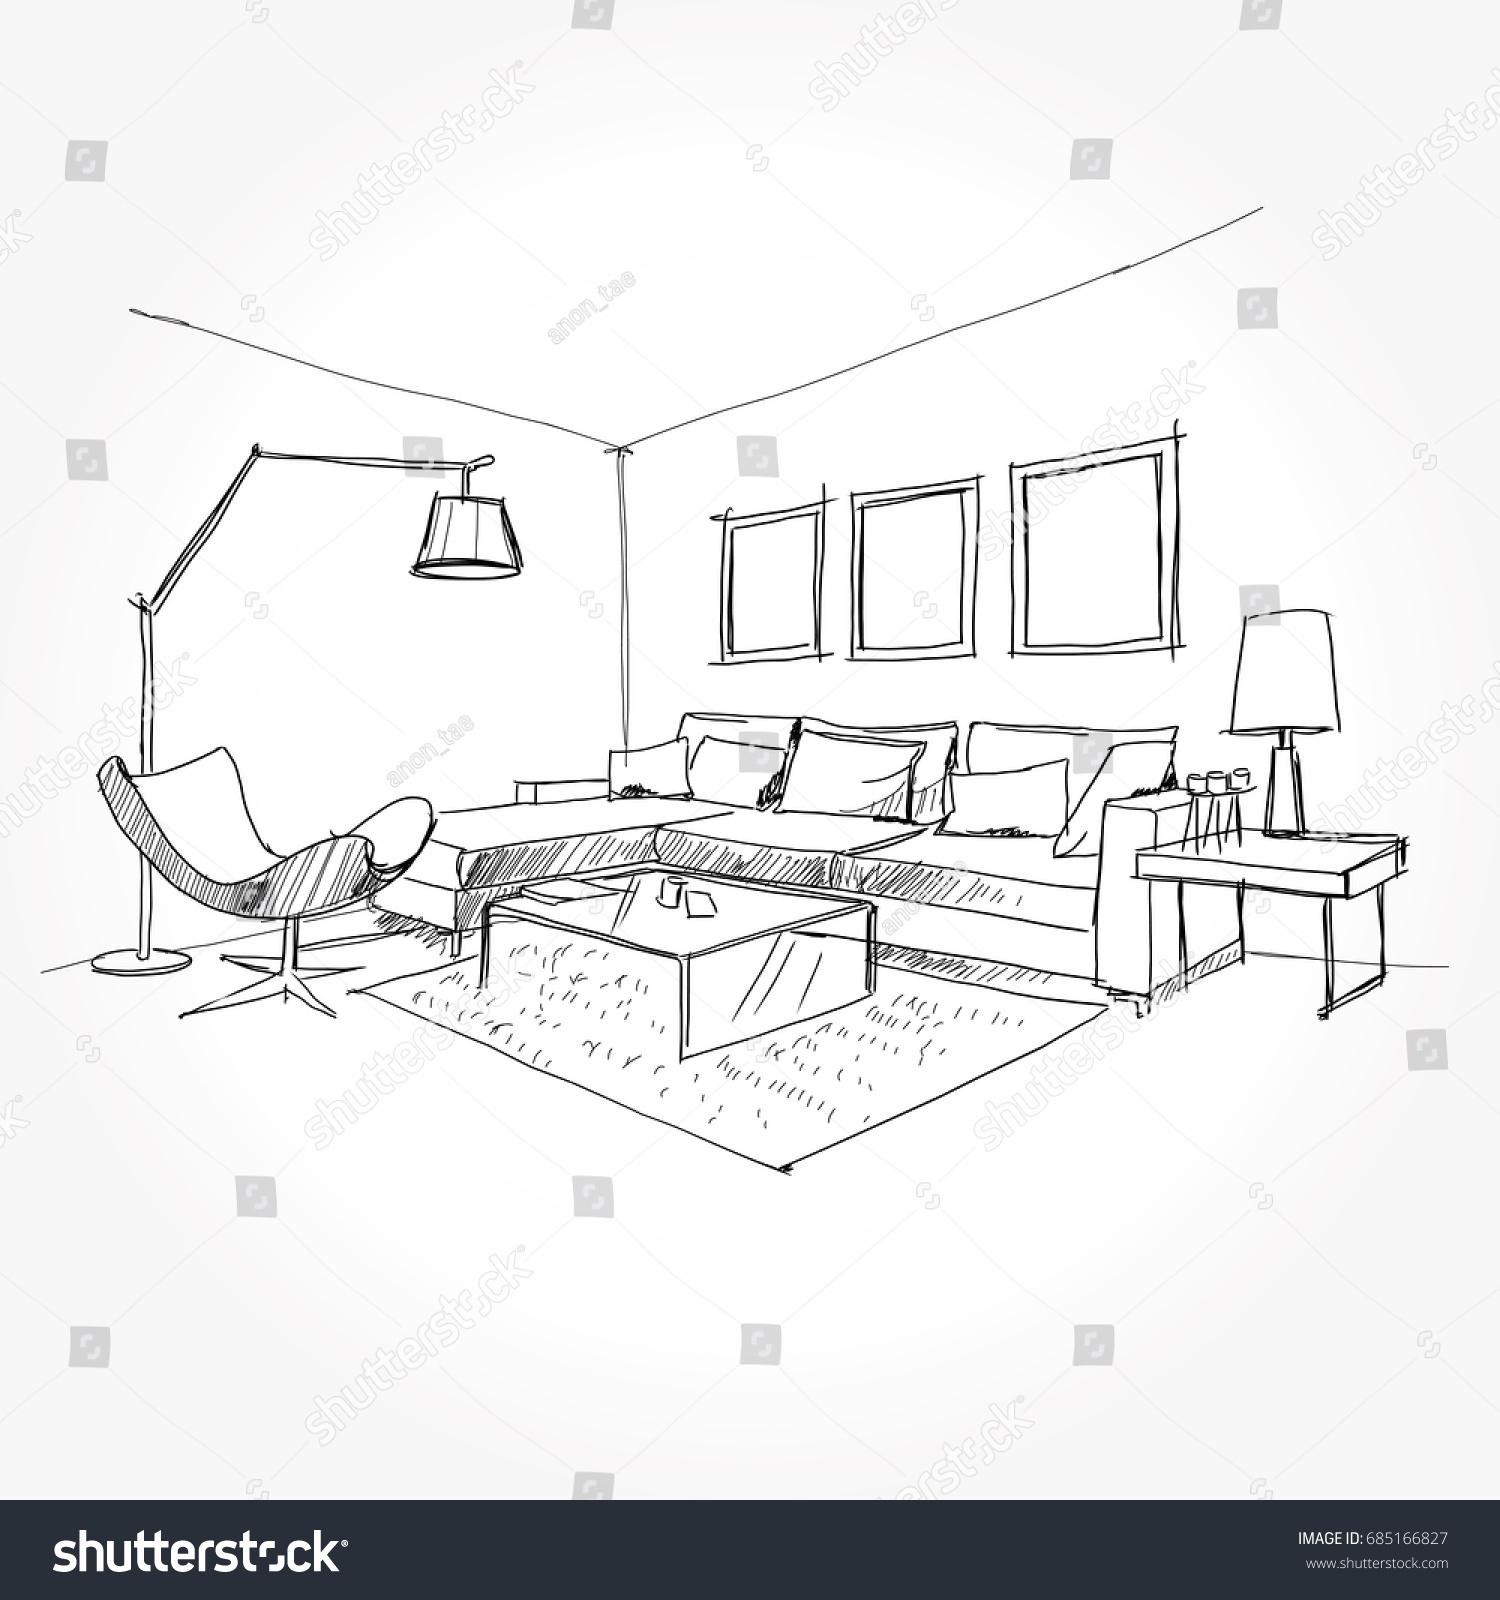 Linear Sketch Interior Living Room Plan Stock Photo (Photo, Vector ...